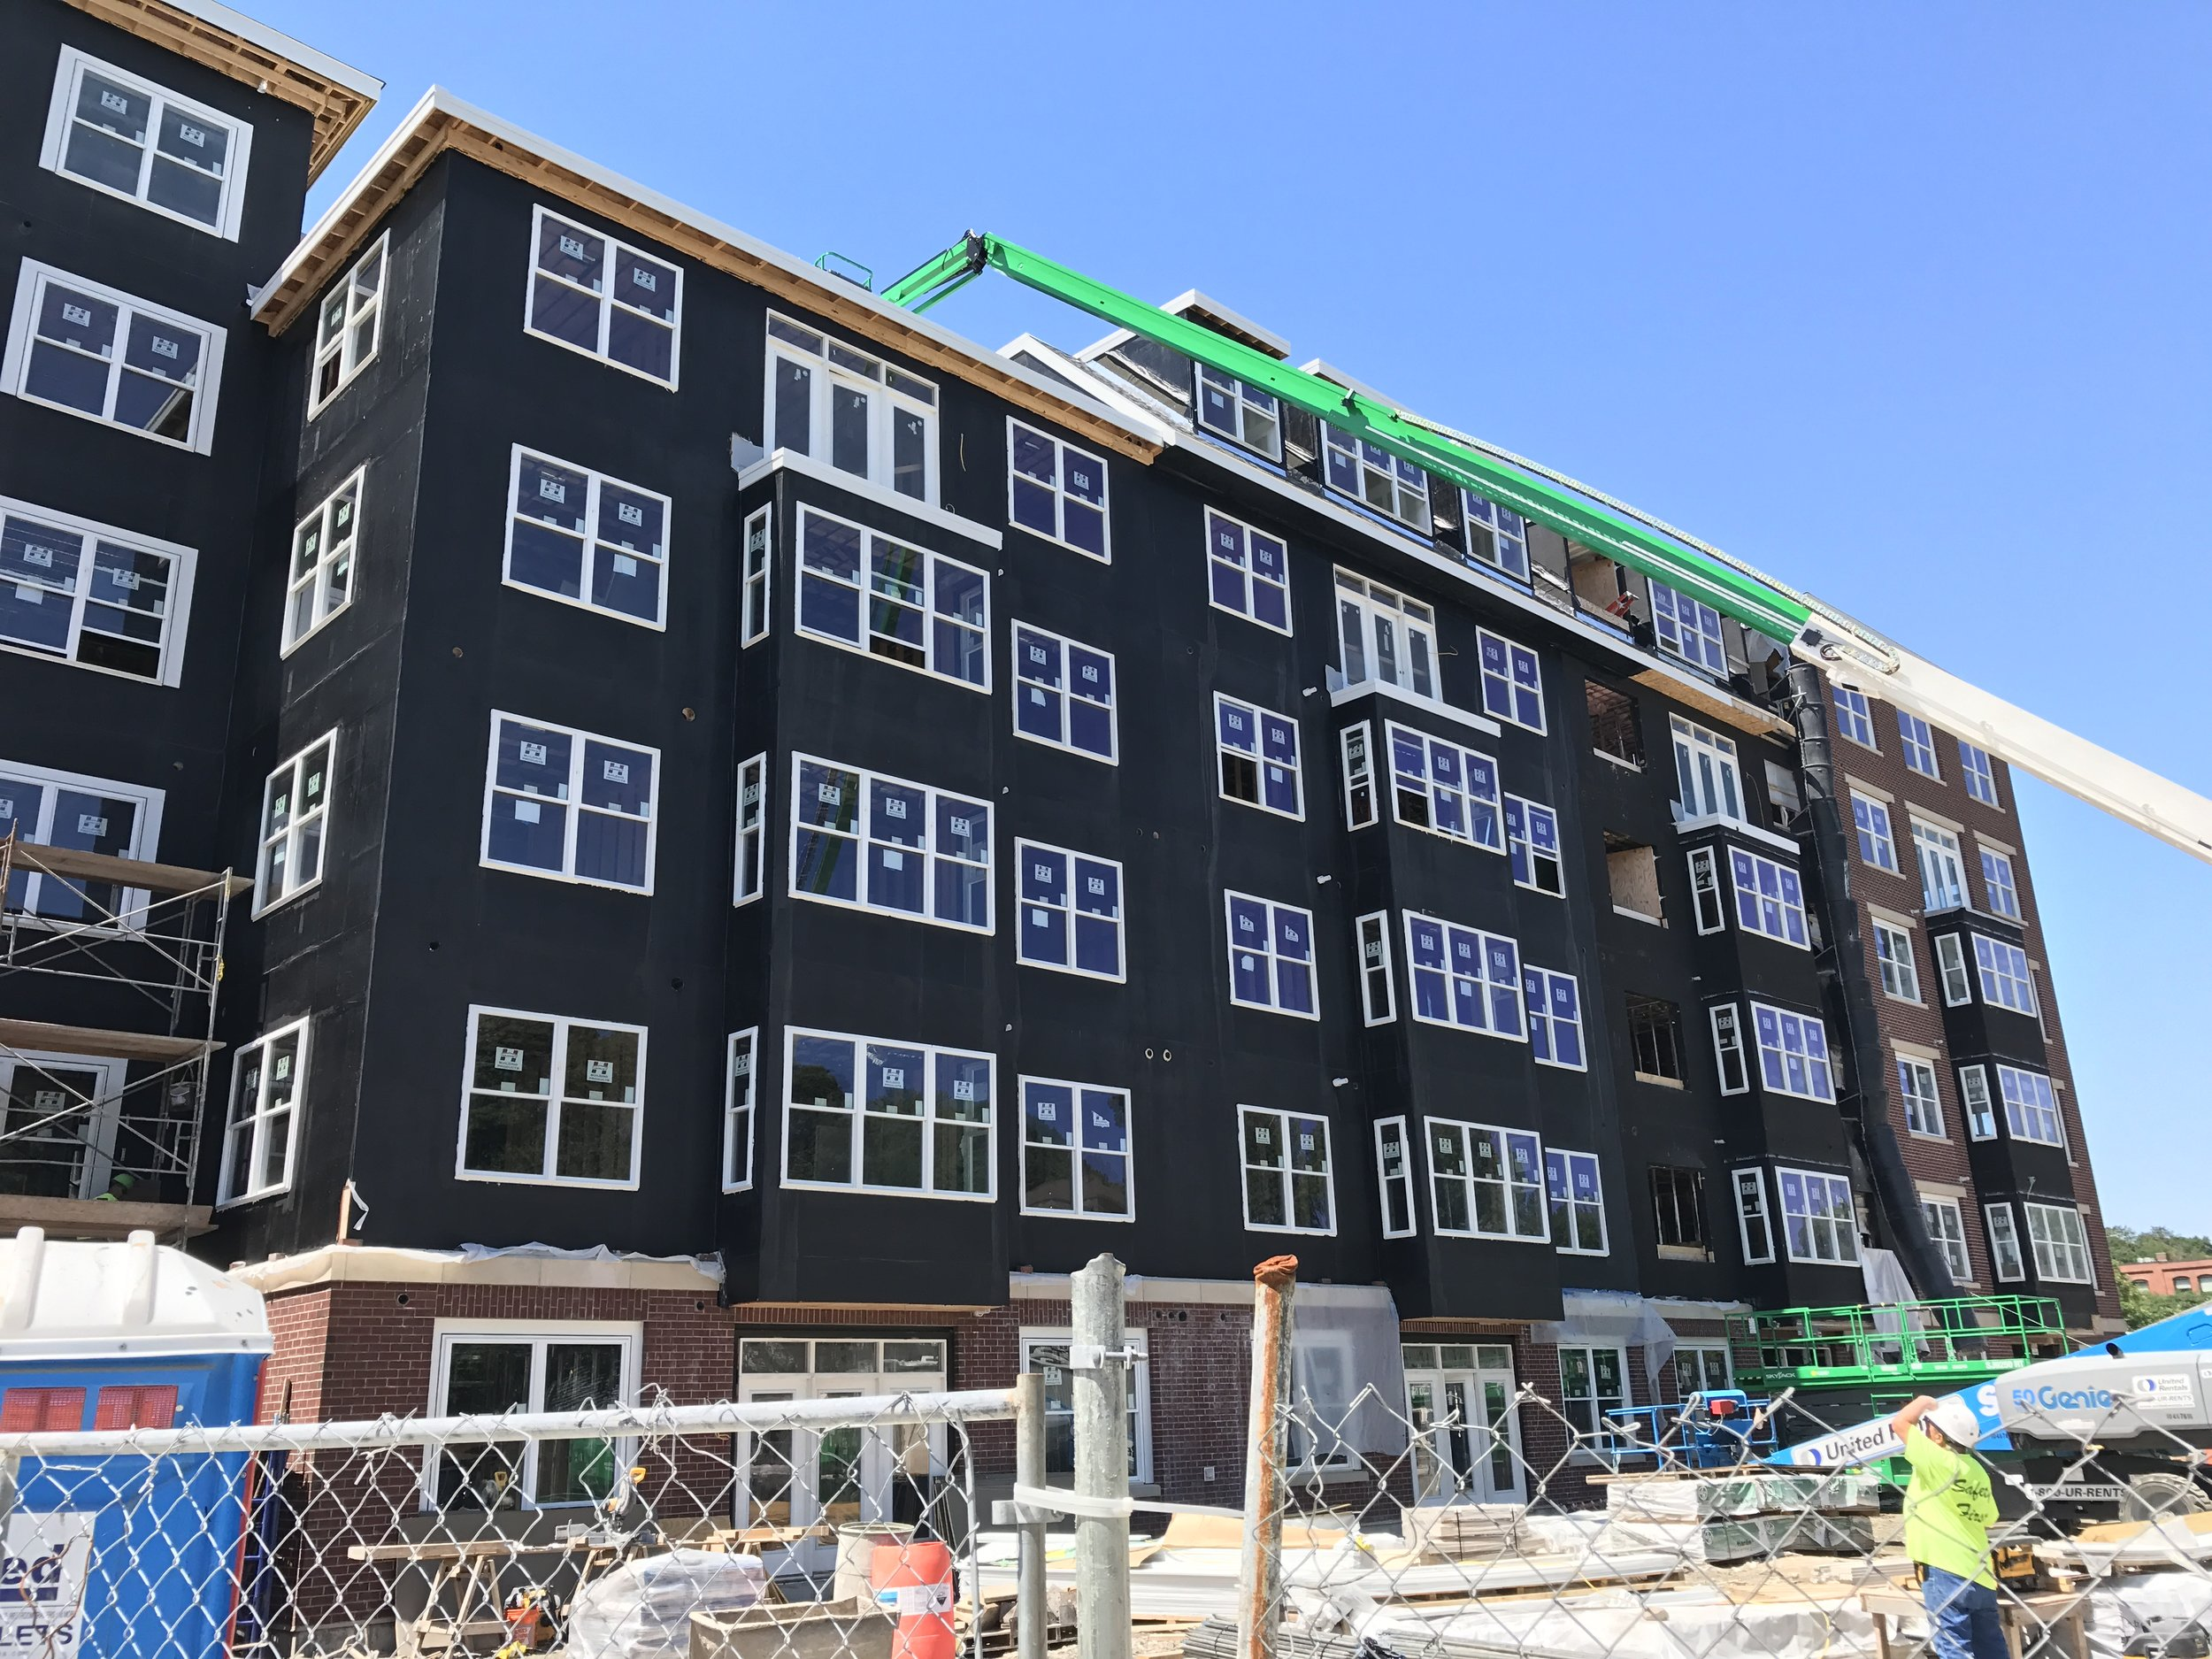 Building envelope construction in progress in Braintree, MA.